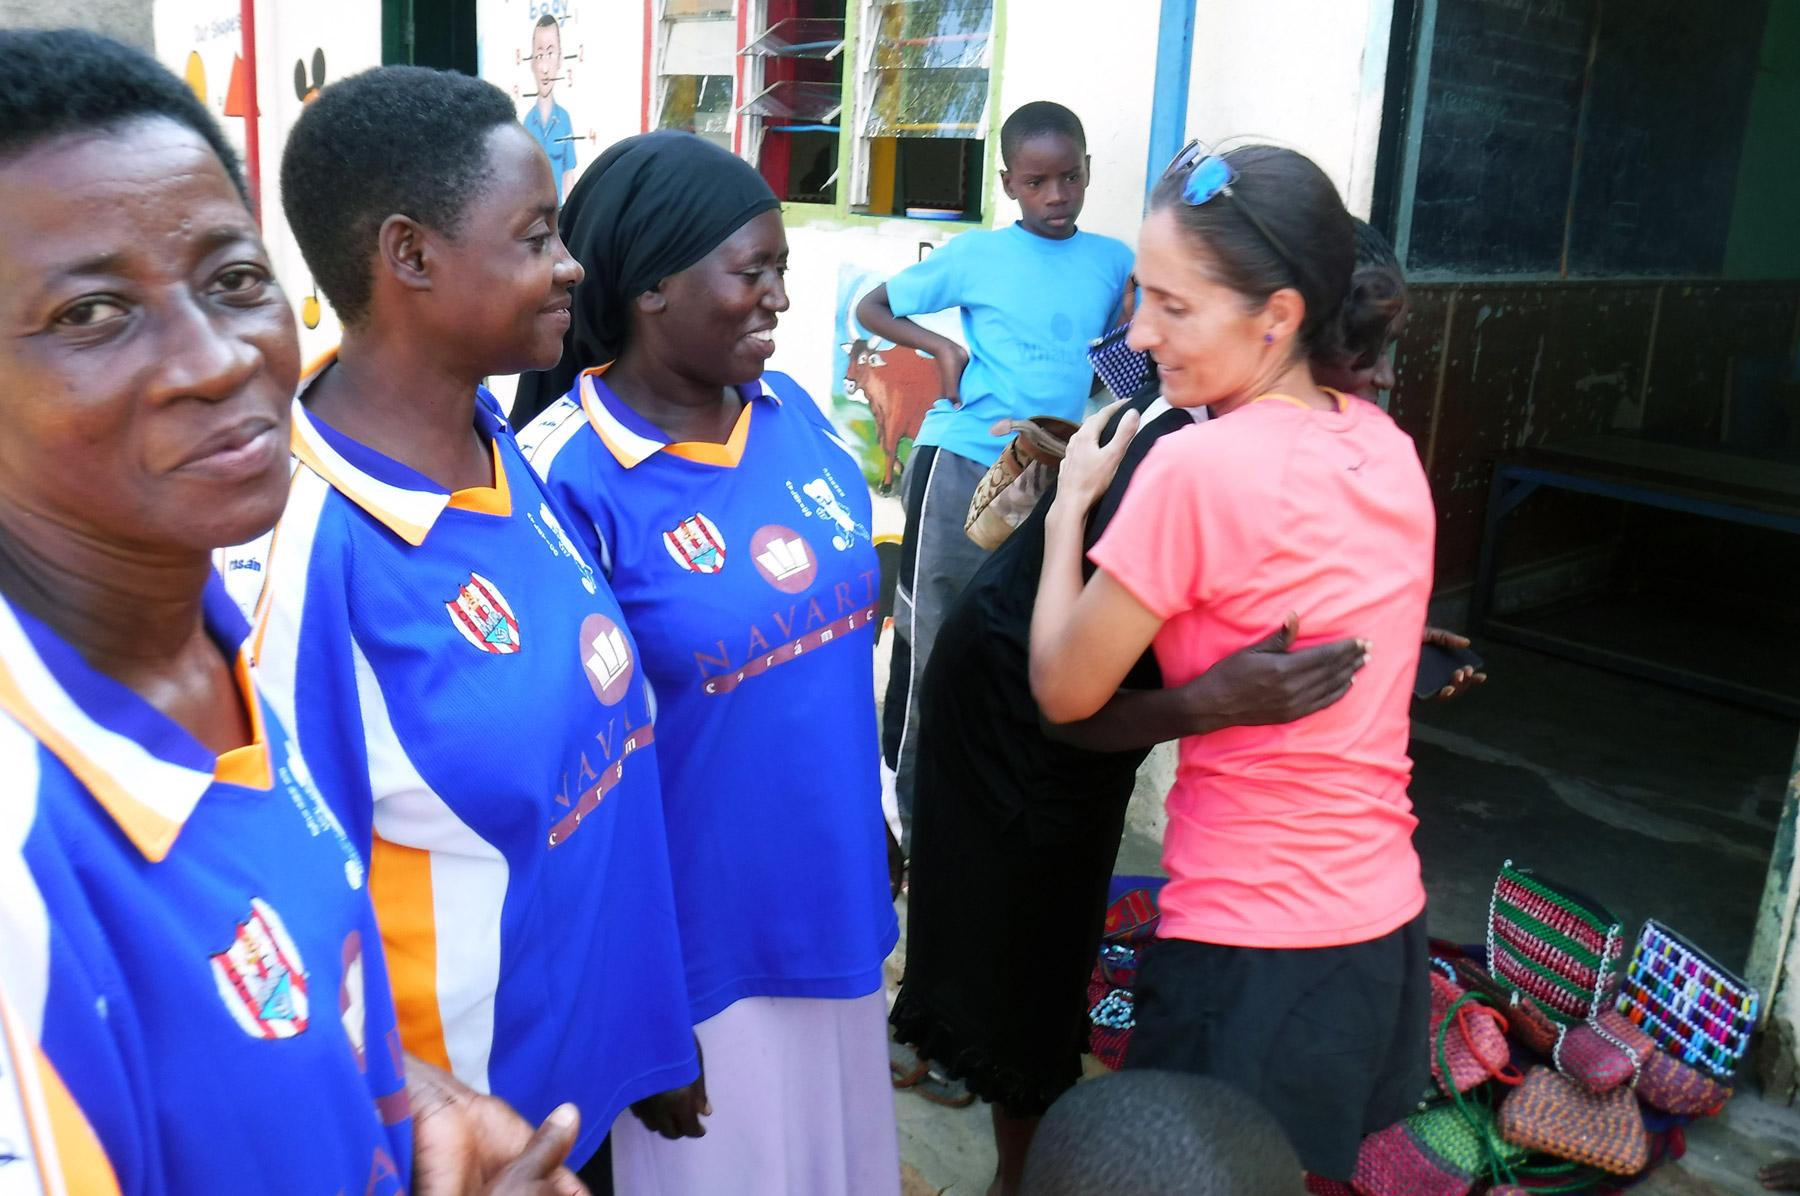 Patricia-Campos-Ejercito-Futbol-ONG-Uganda-Sida